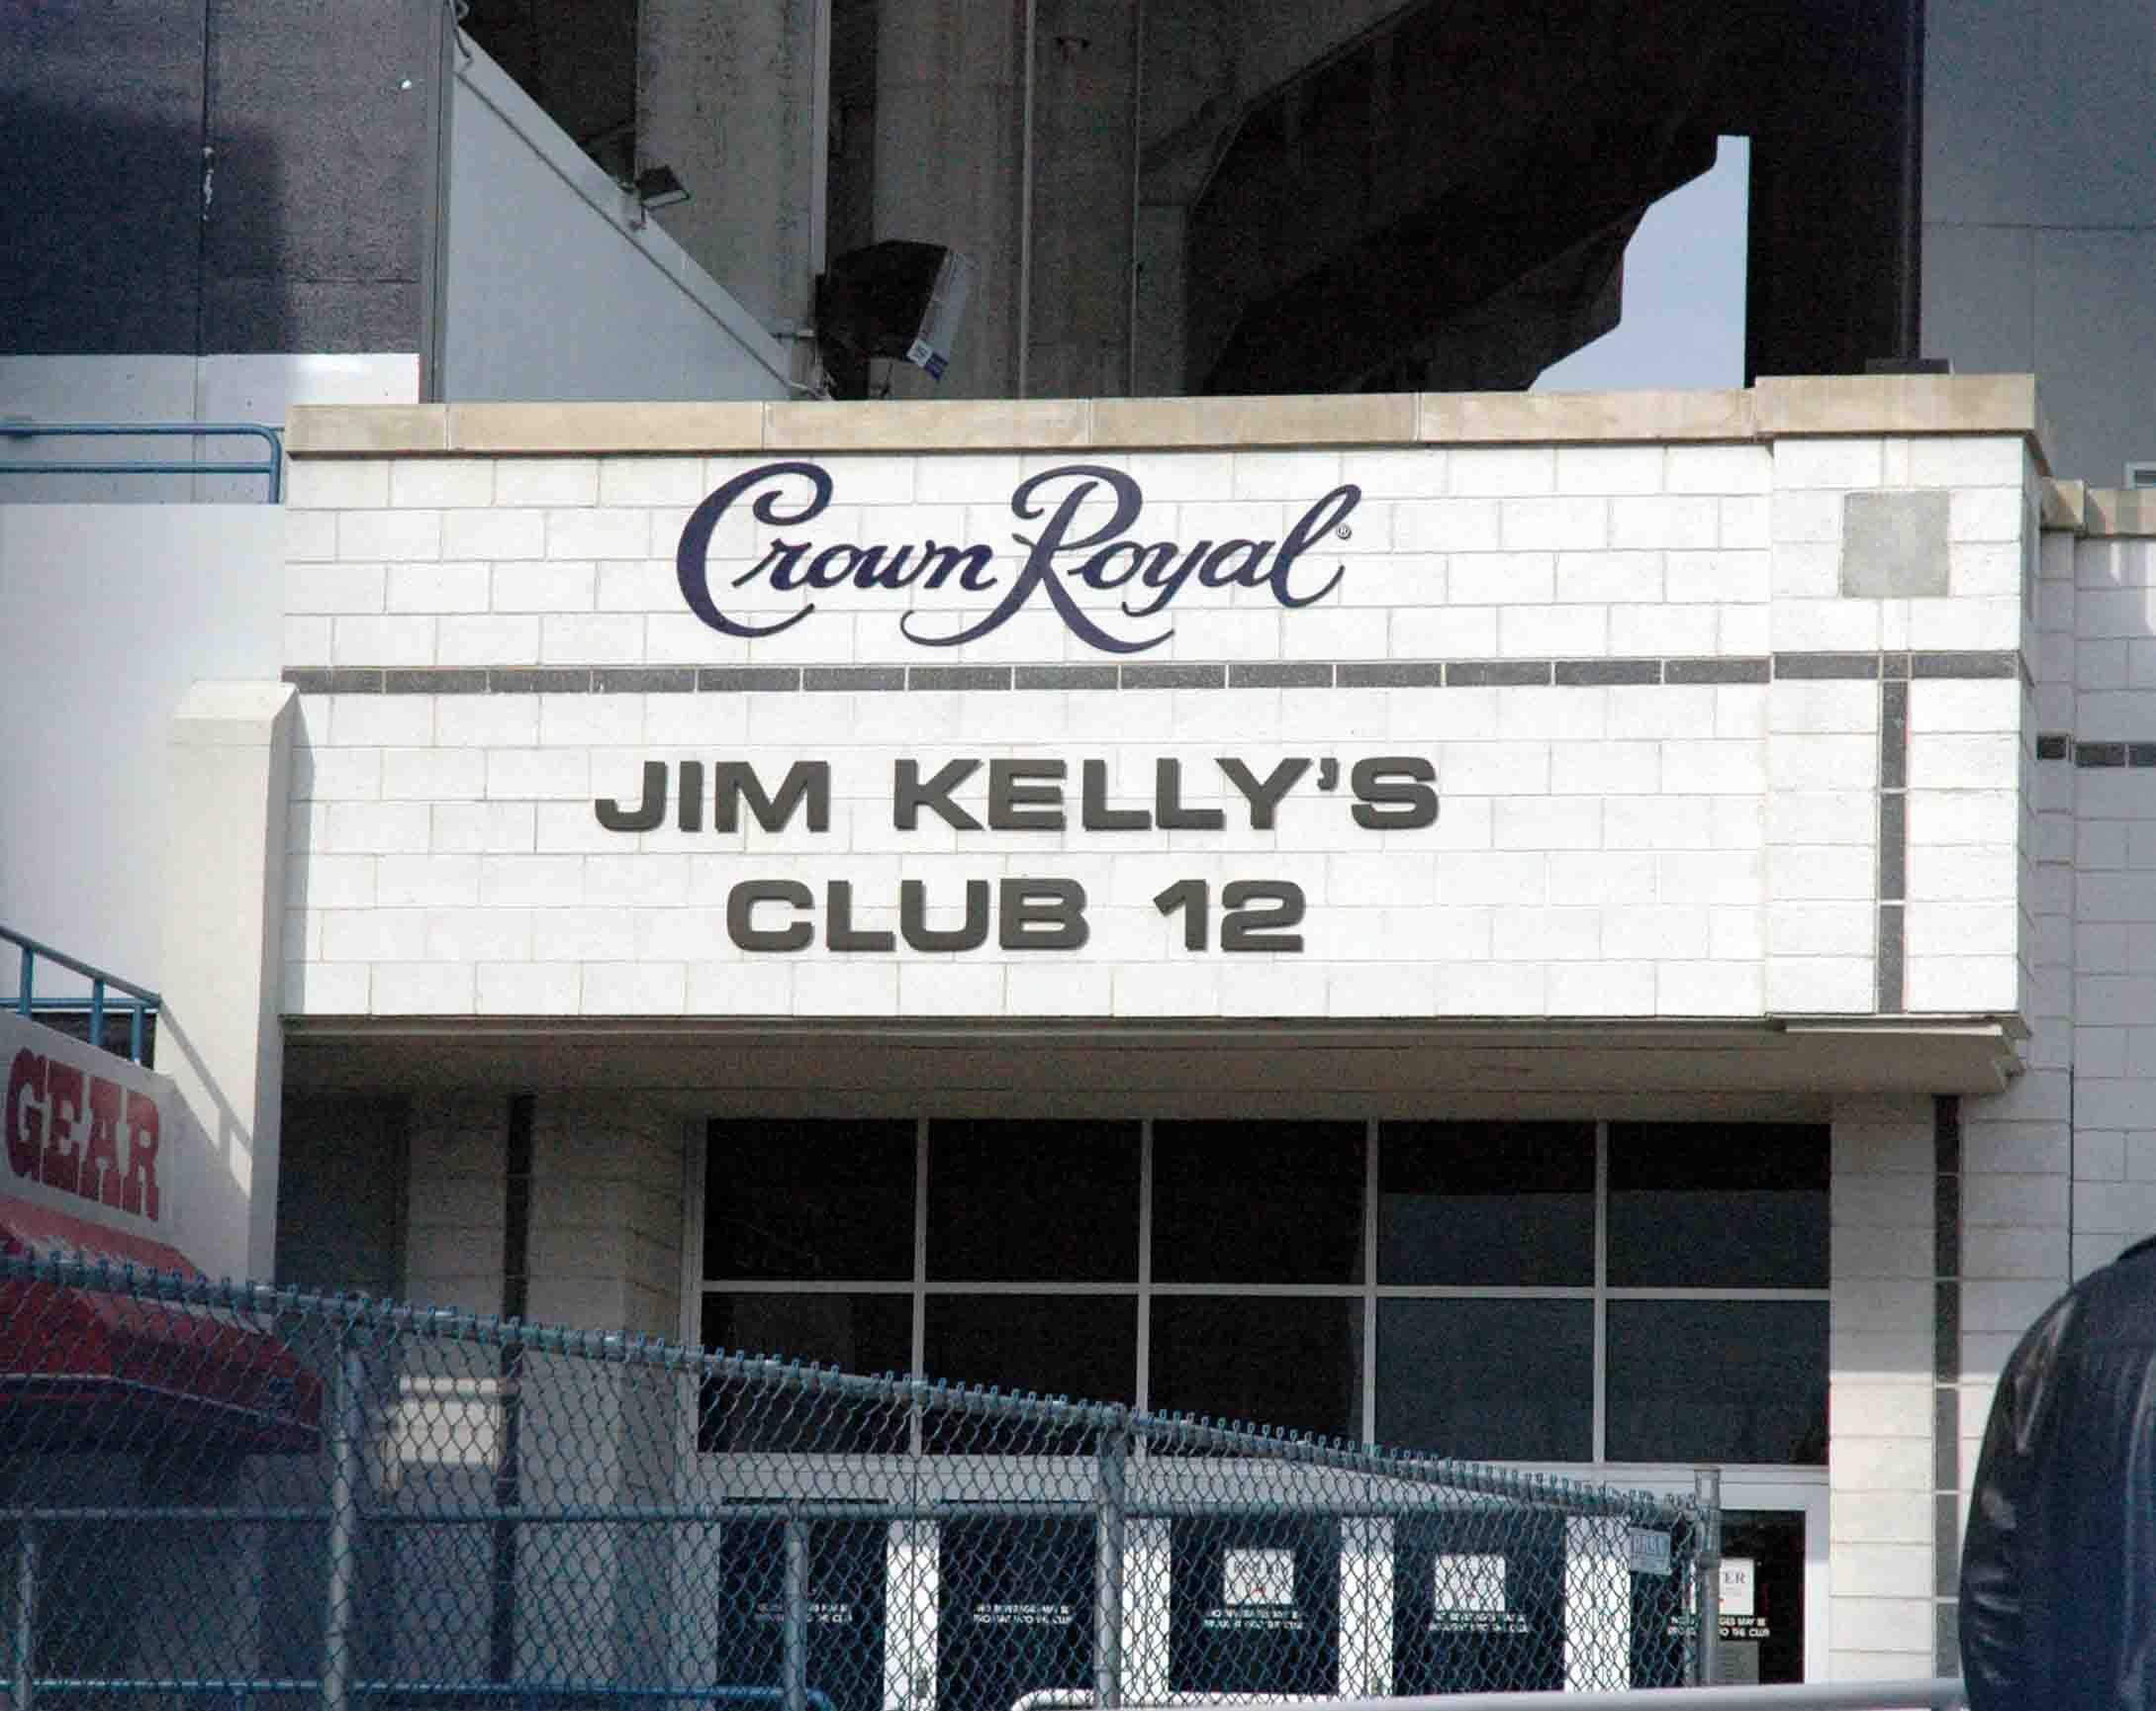 Jim kellys club 12 at ralph wilson stadium jim kelly